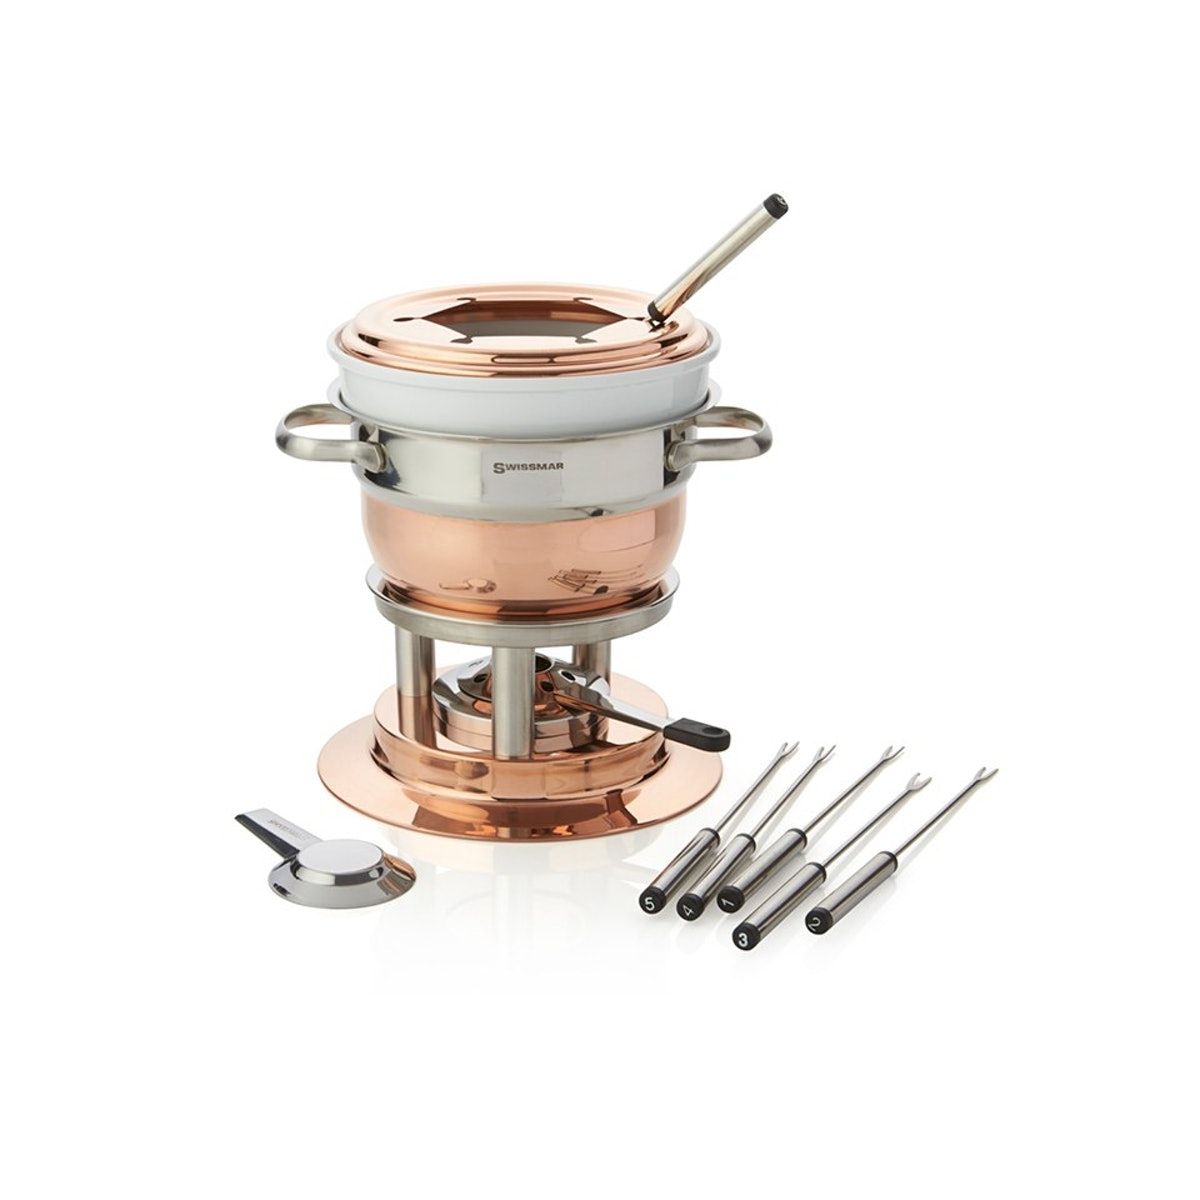 swissmar fondue set.jpg